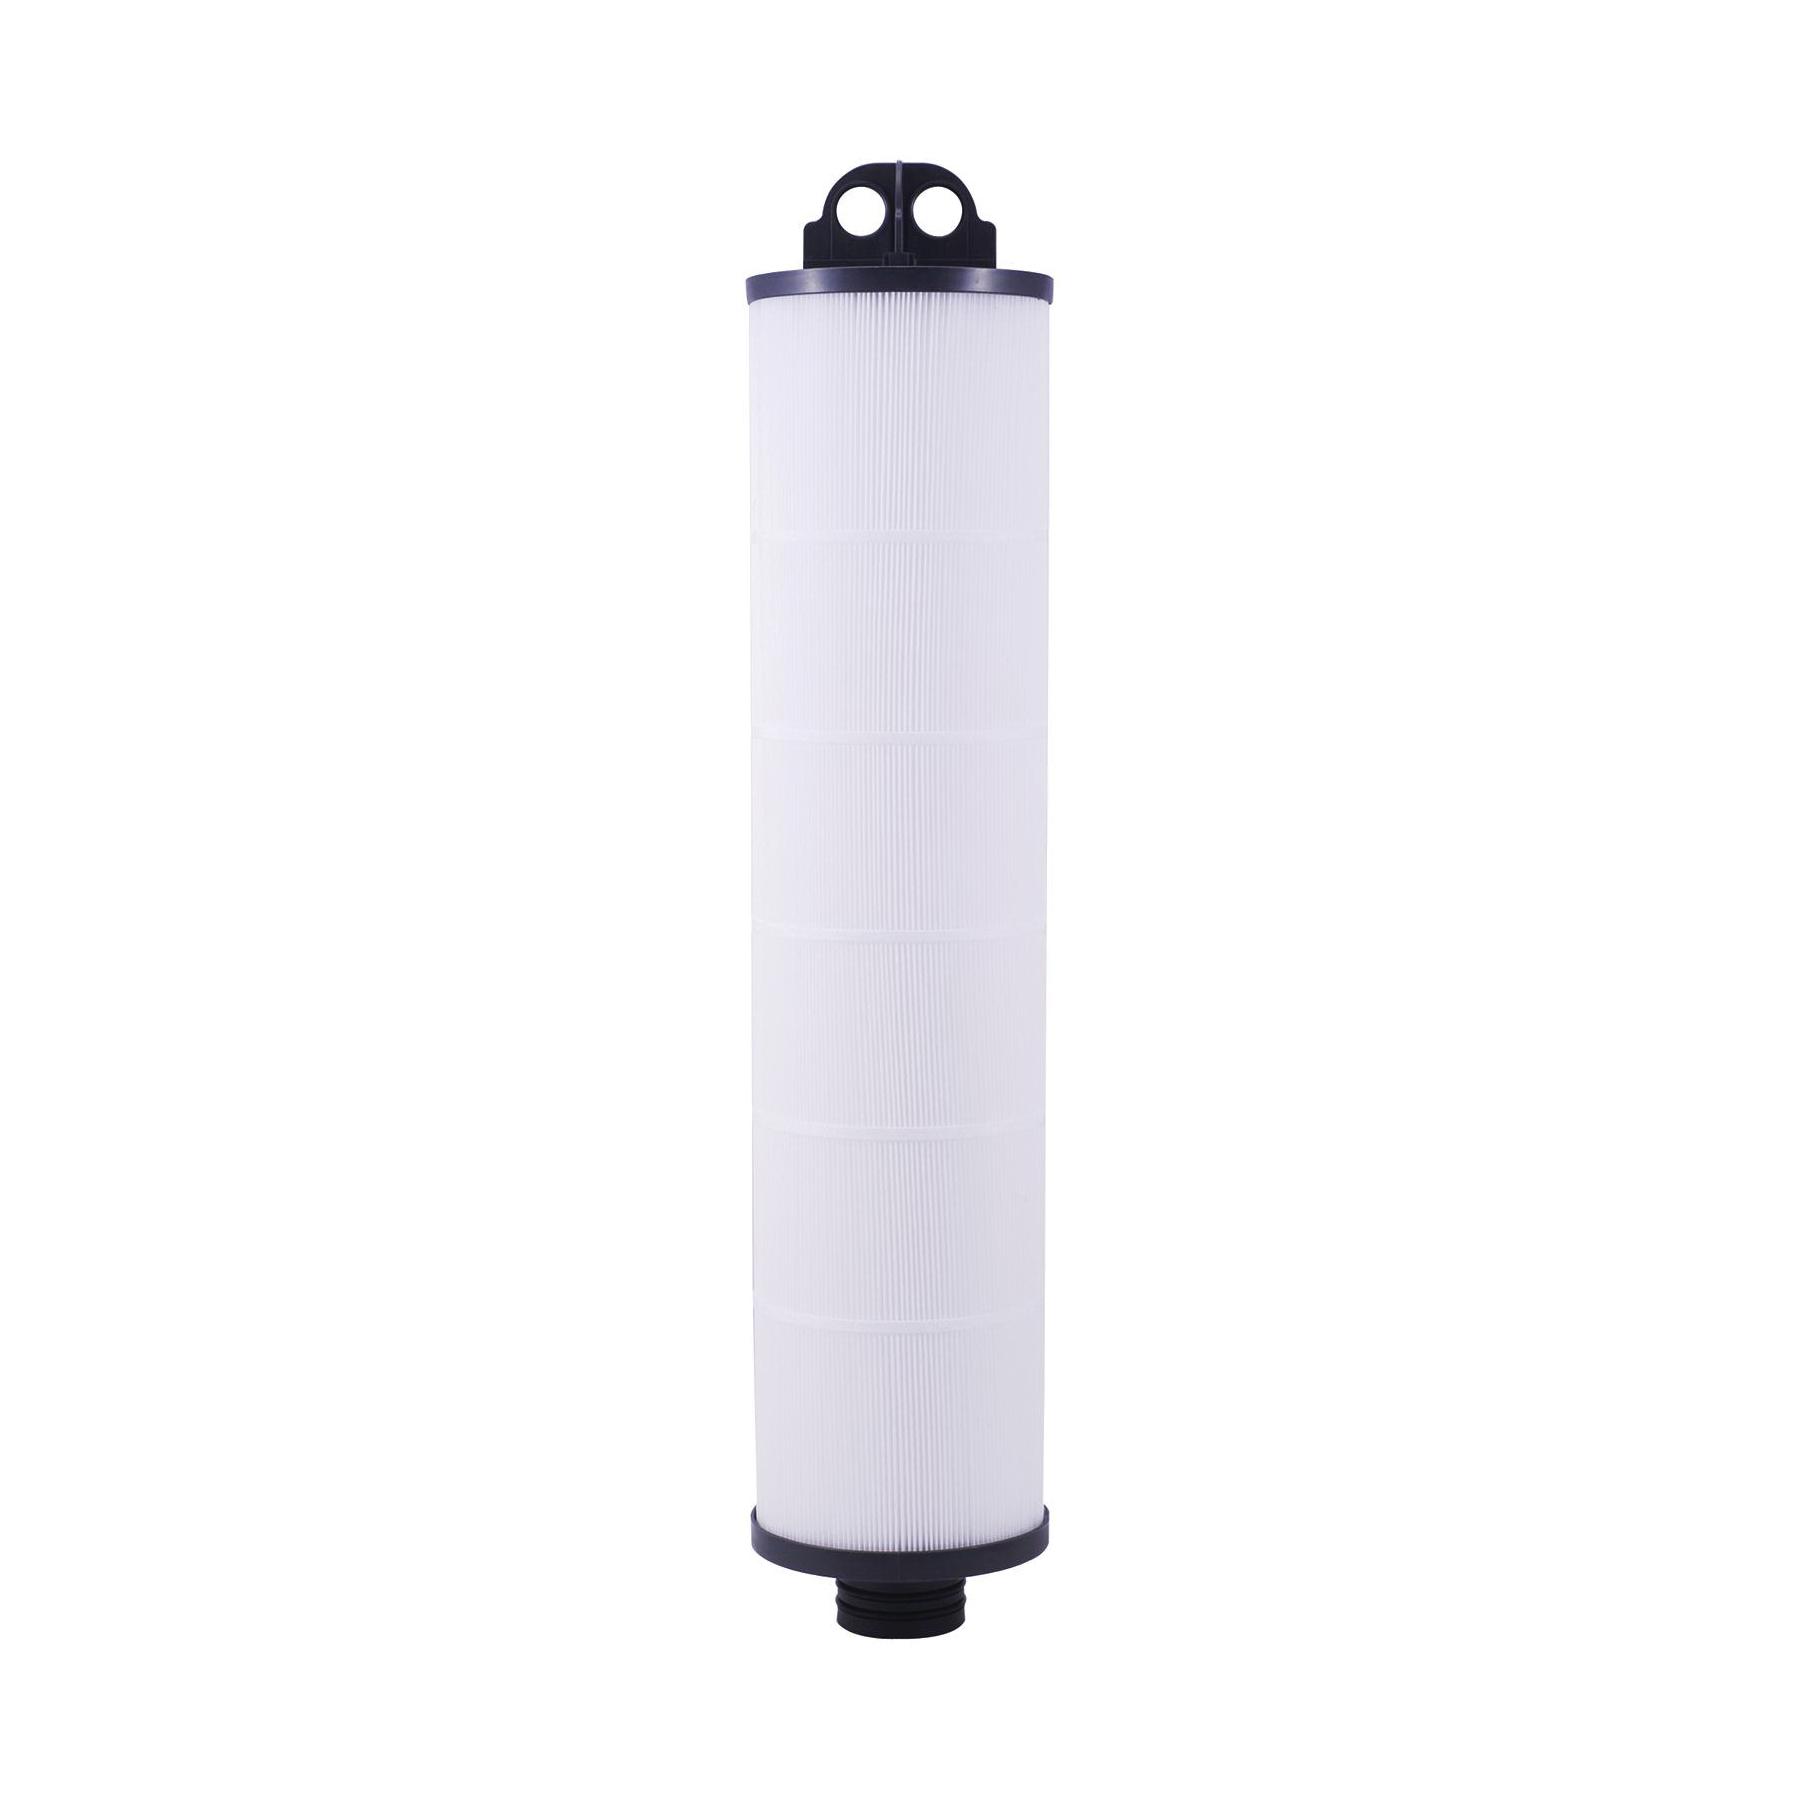 WATTS® 7100305 PWWJC Jumbo Pleated Filter Cartridge, 42.7 in L, Polypropylene